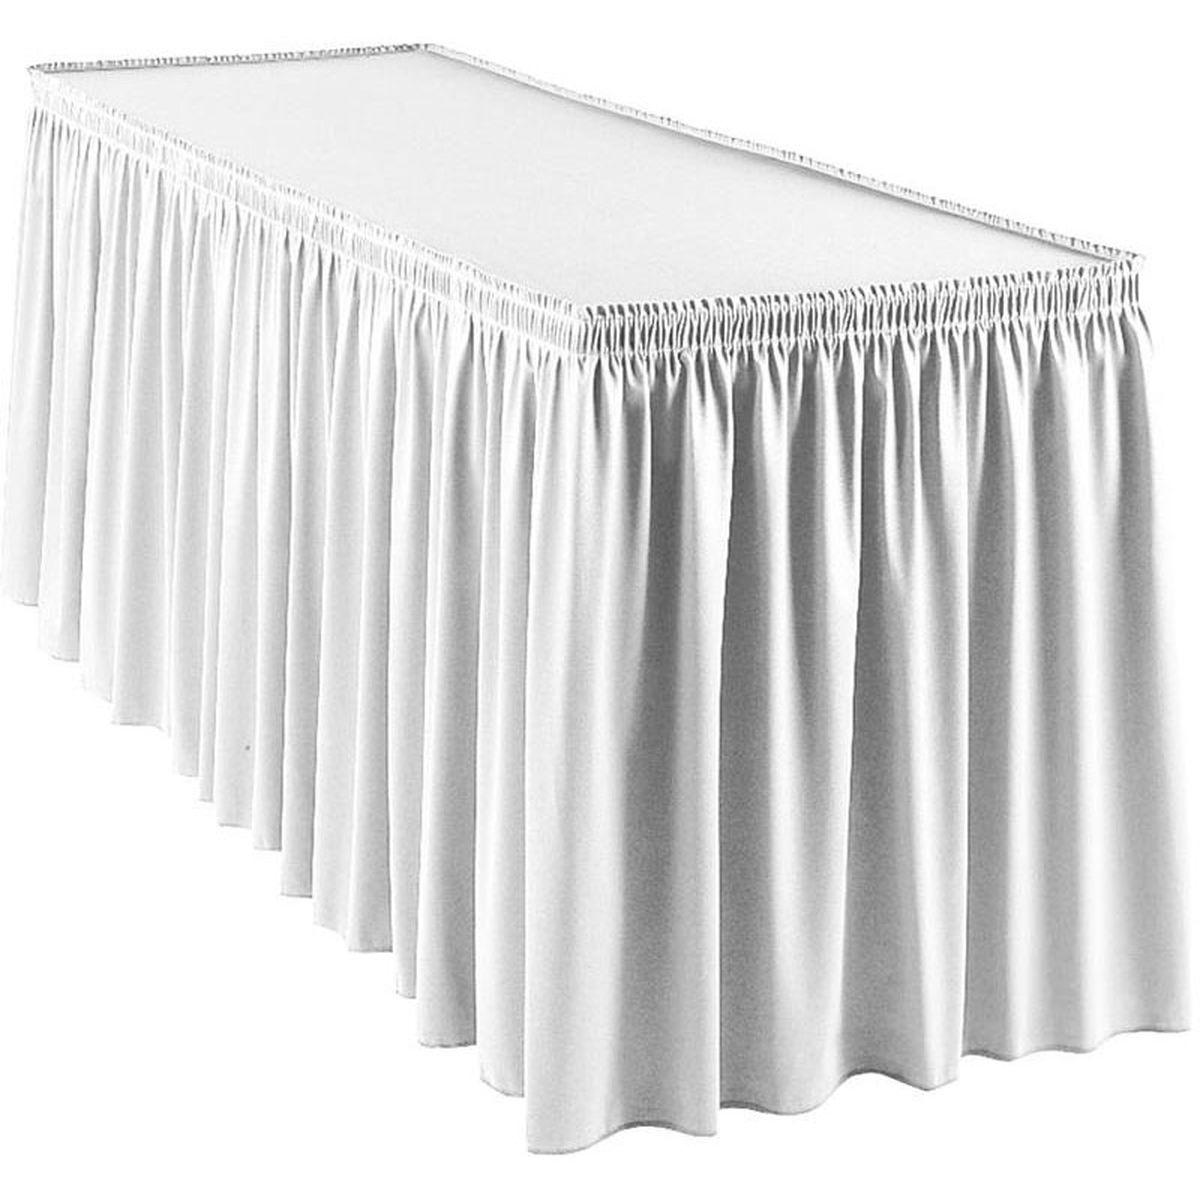 13u2032 Table Skirt Counter Height White